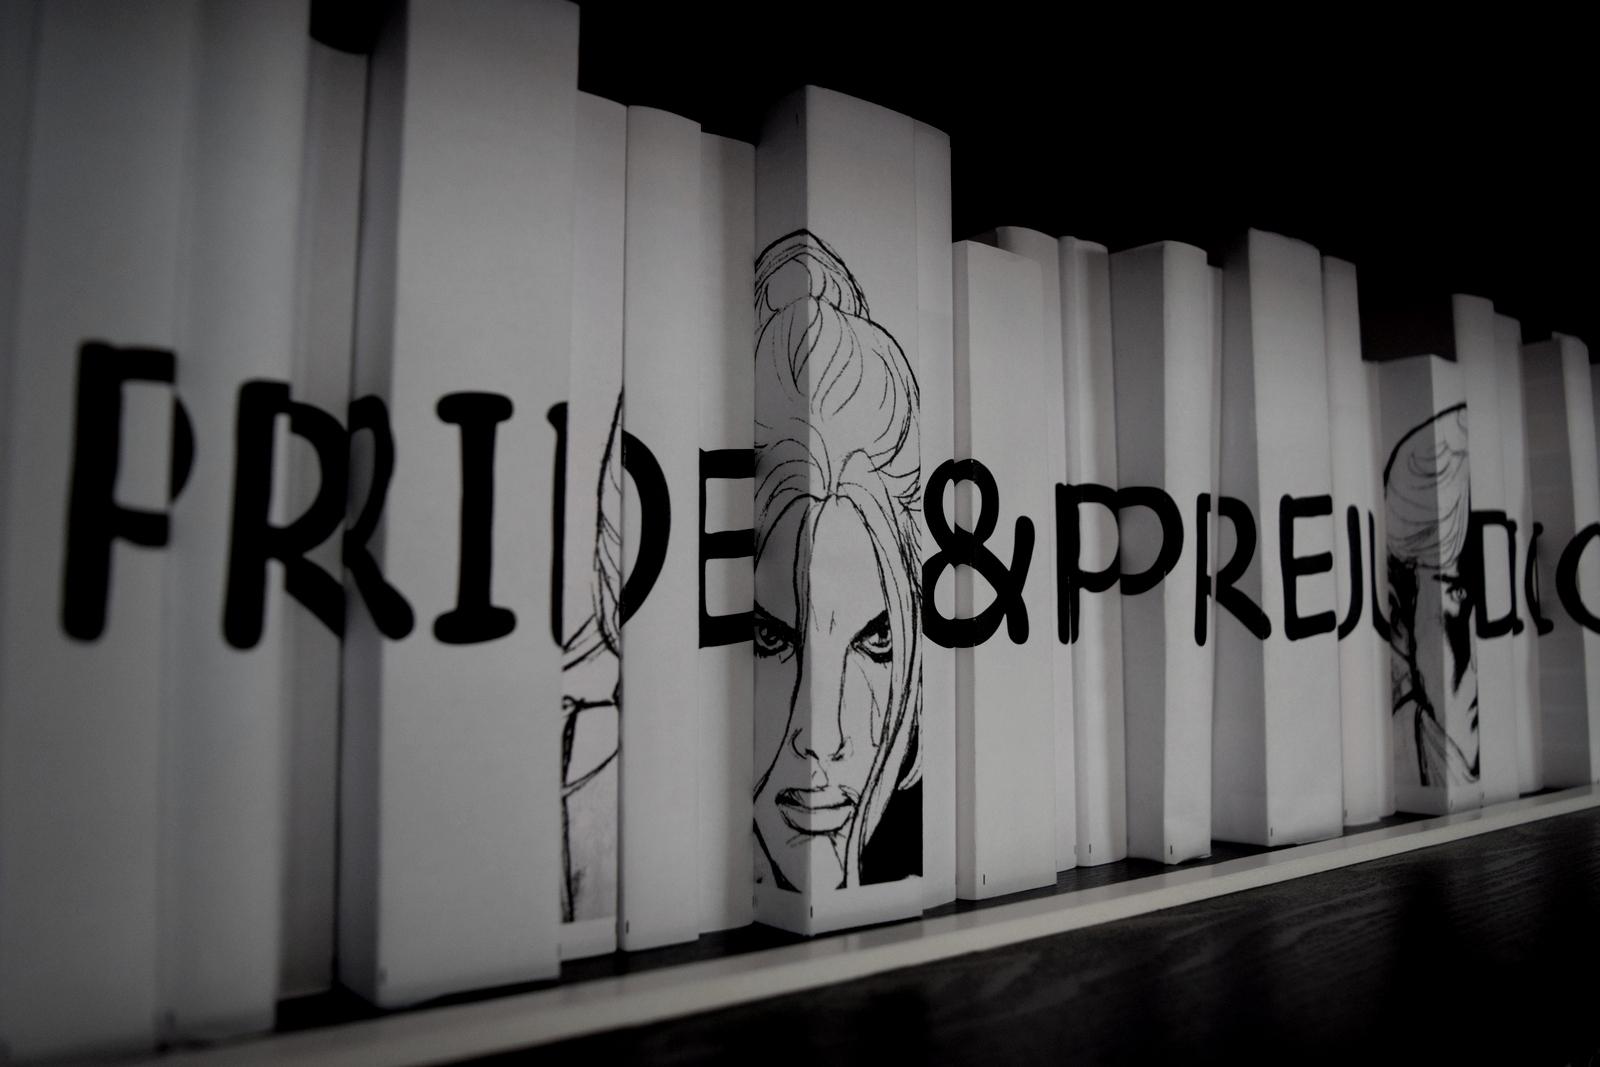 Pride, Prejudice & Perceptions - Photo: Tasha Marks